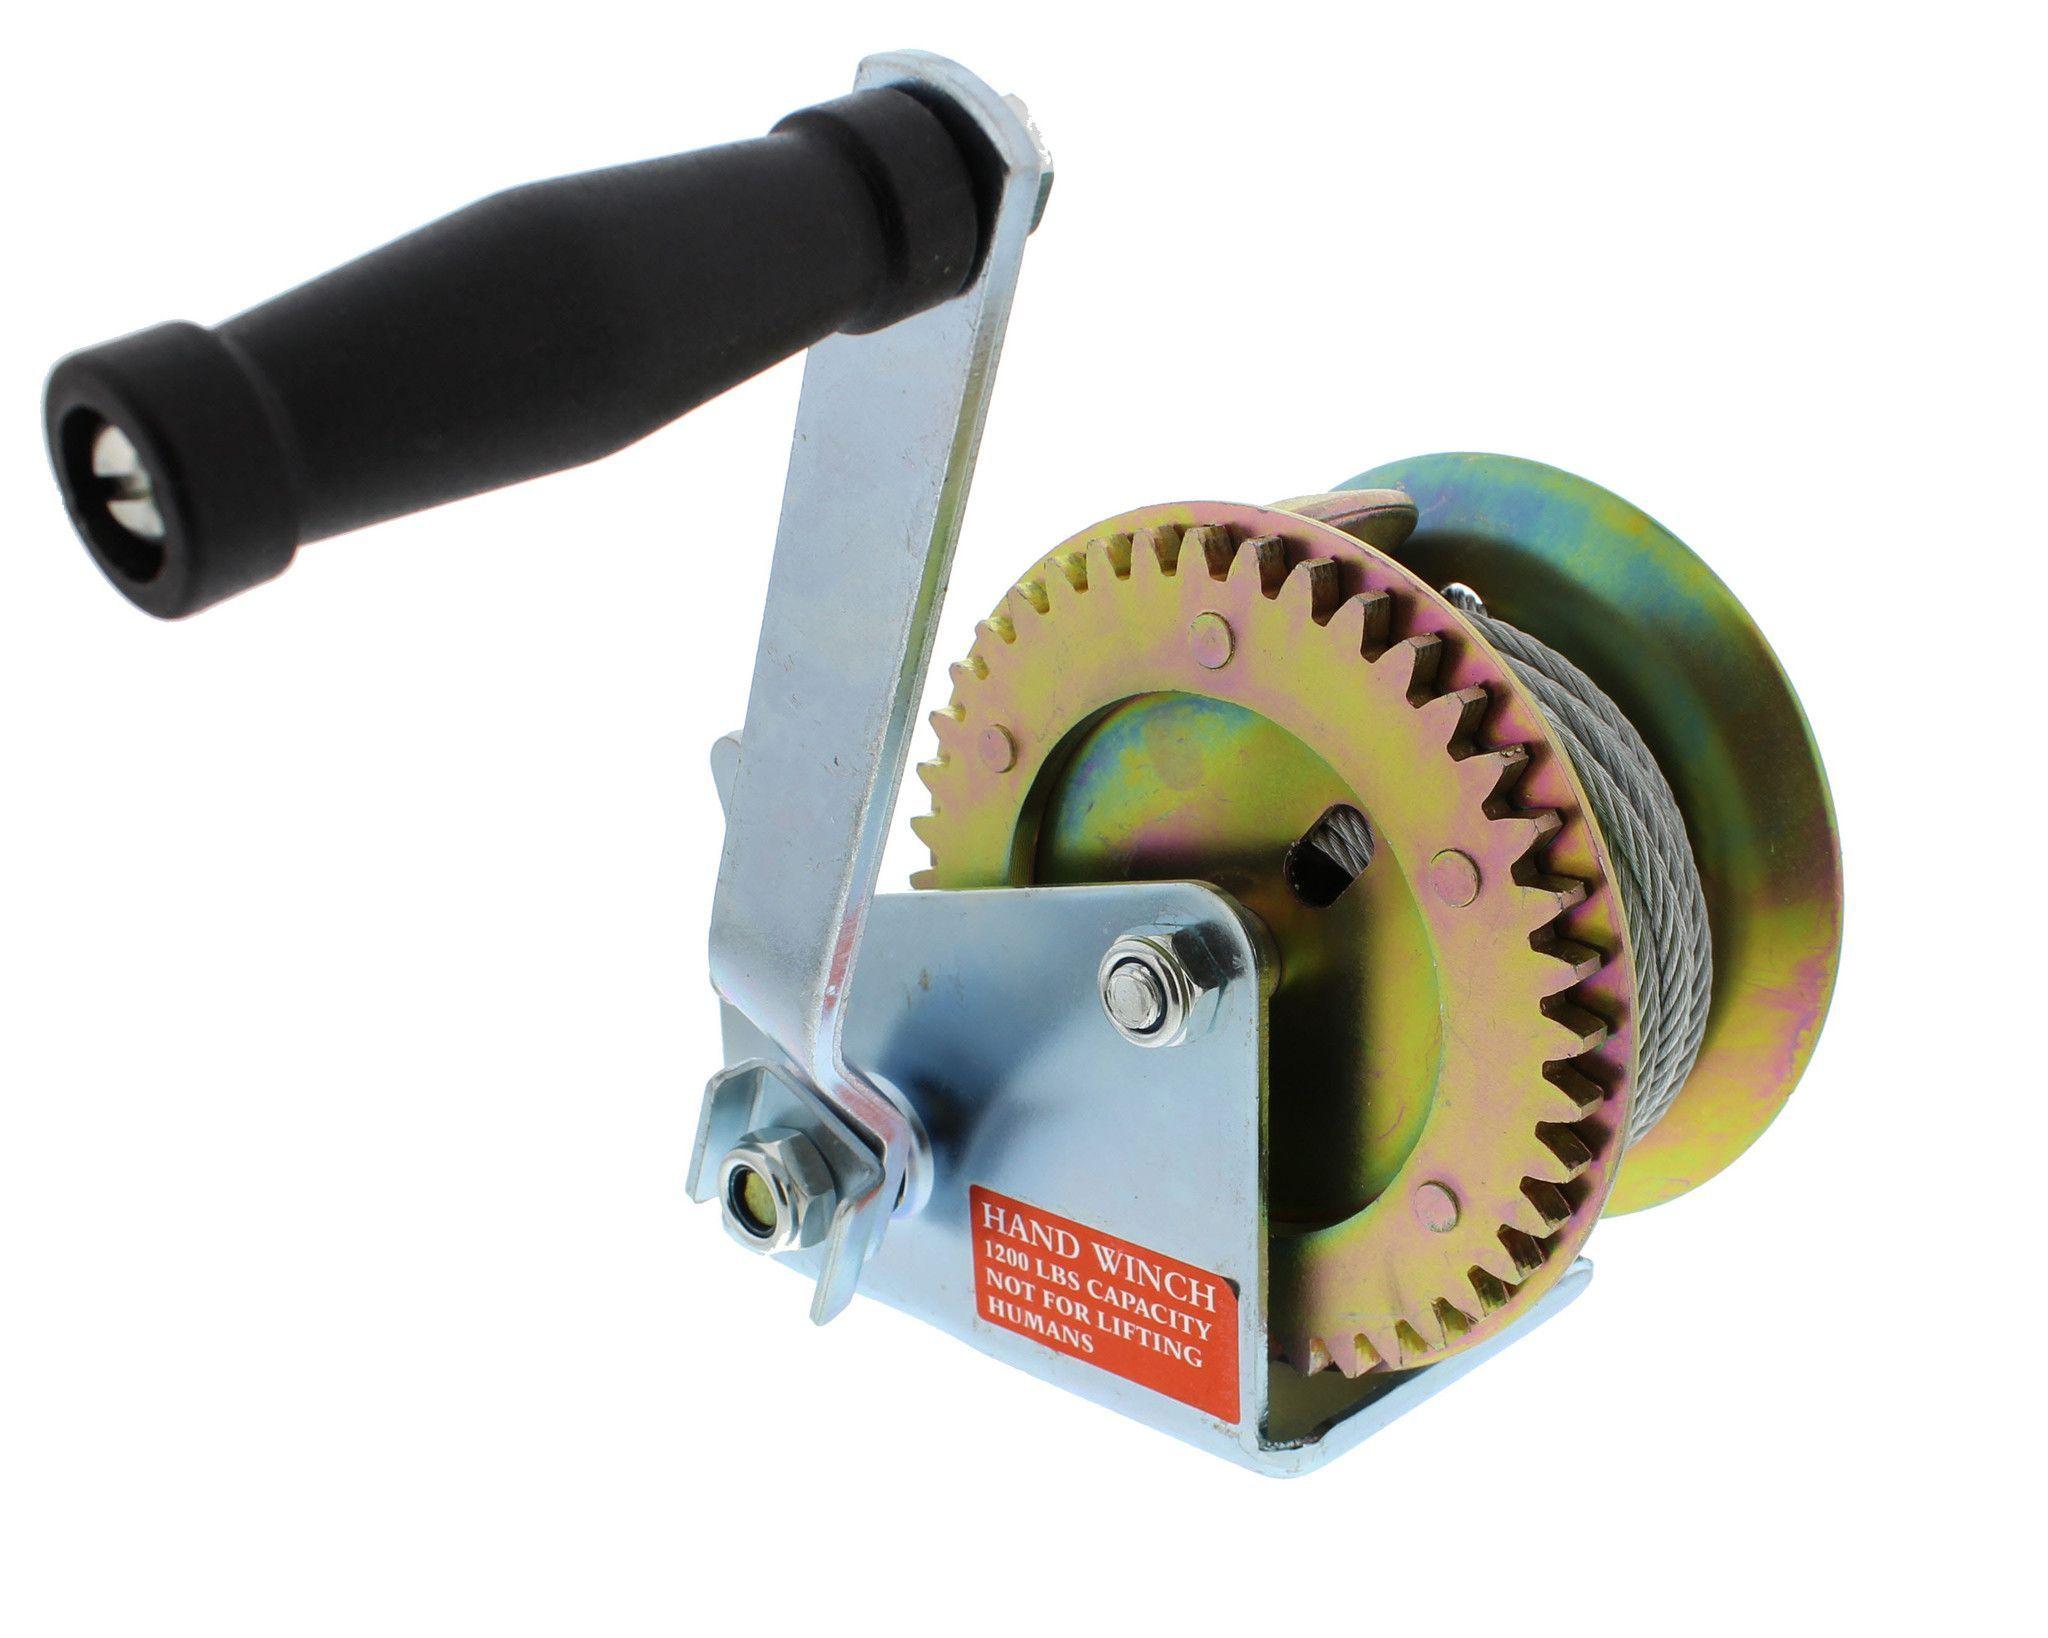 DIY & Tools 900 kg Hand Winch Ratchet Mechanism Winch Hand